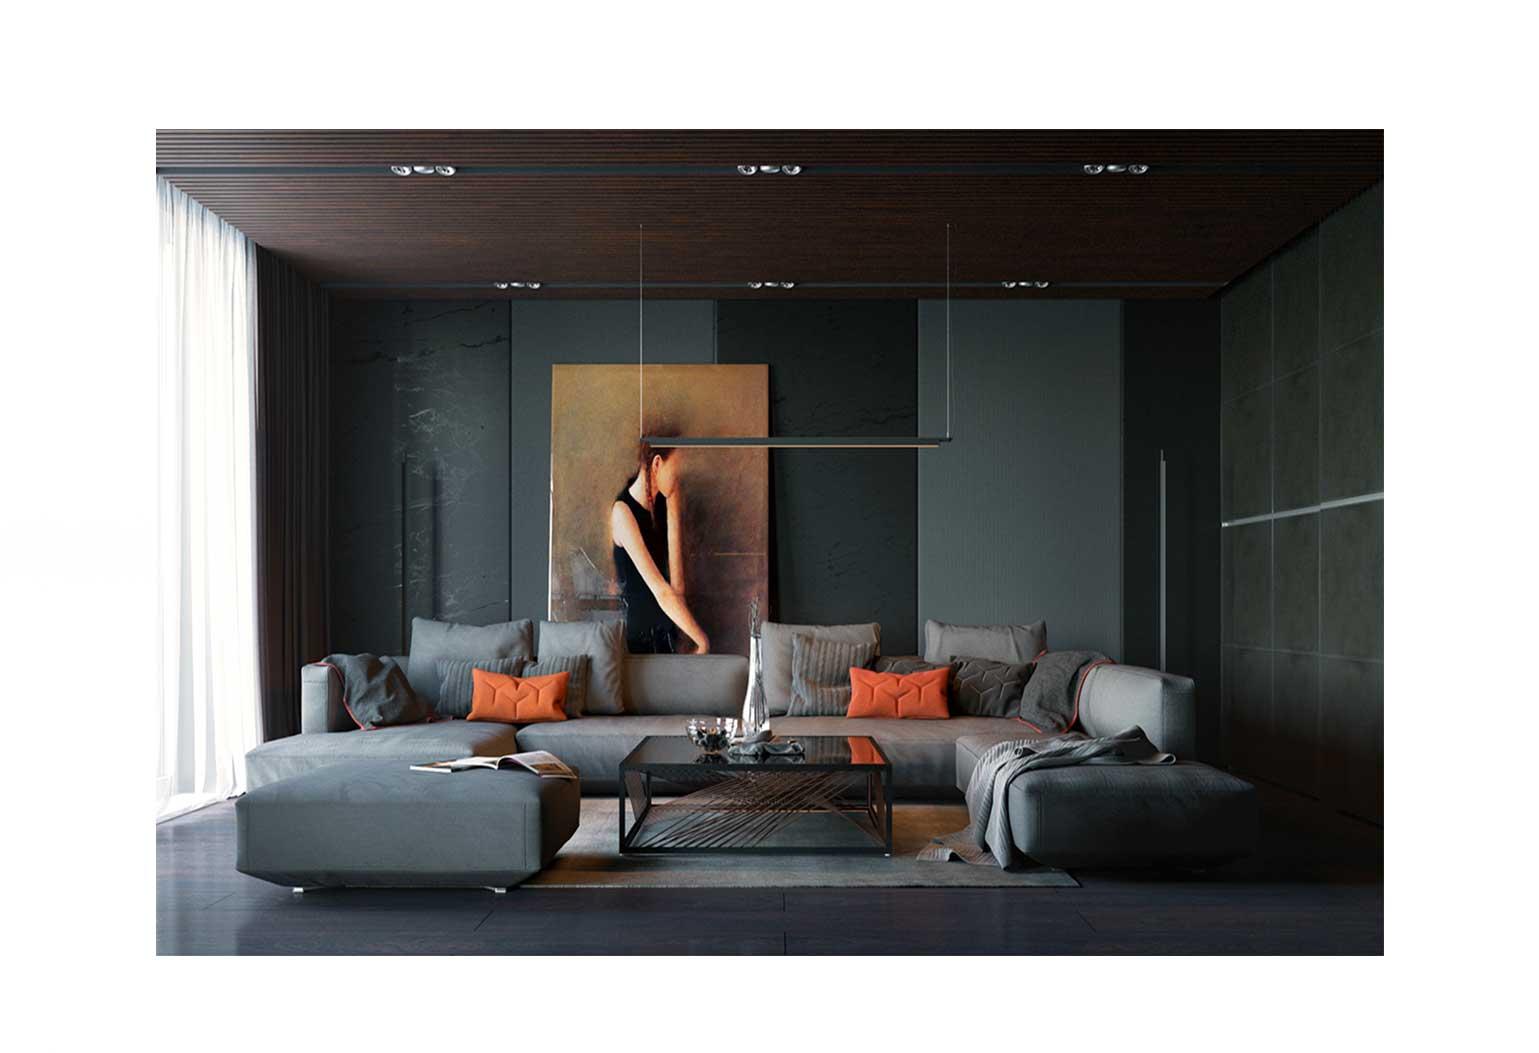 Design An Art centric Room015 - چگونه یک اتاق هنری را طراحی کنیم؟